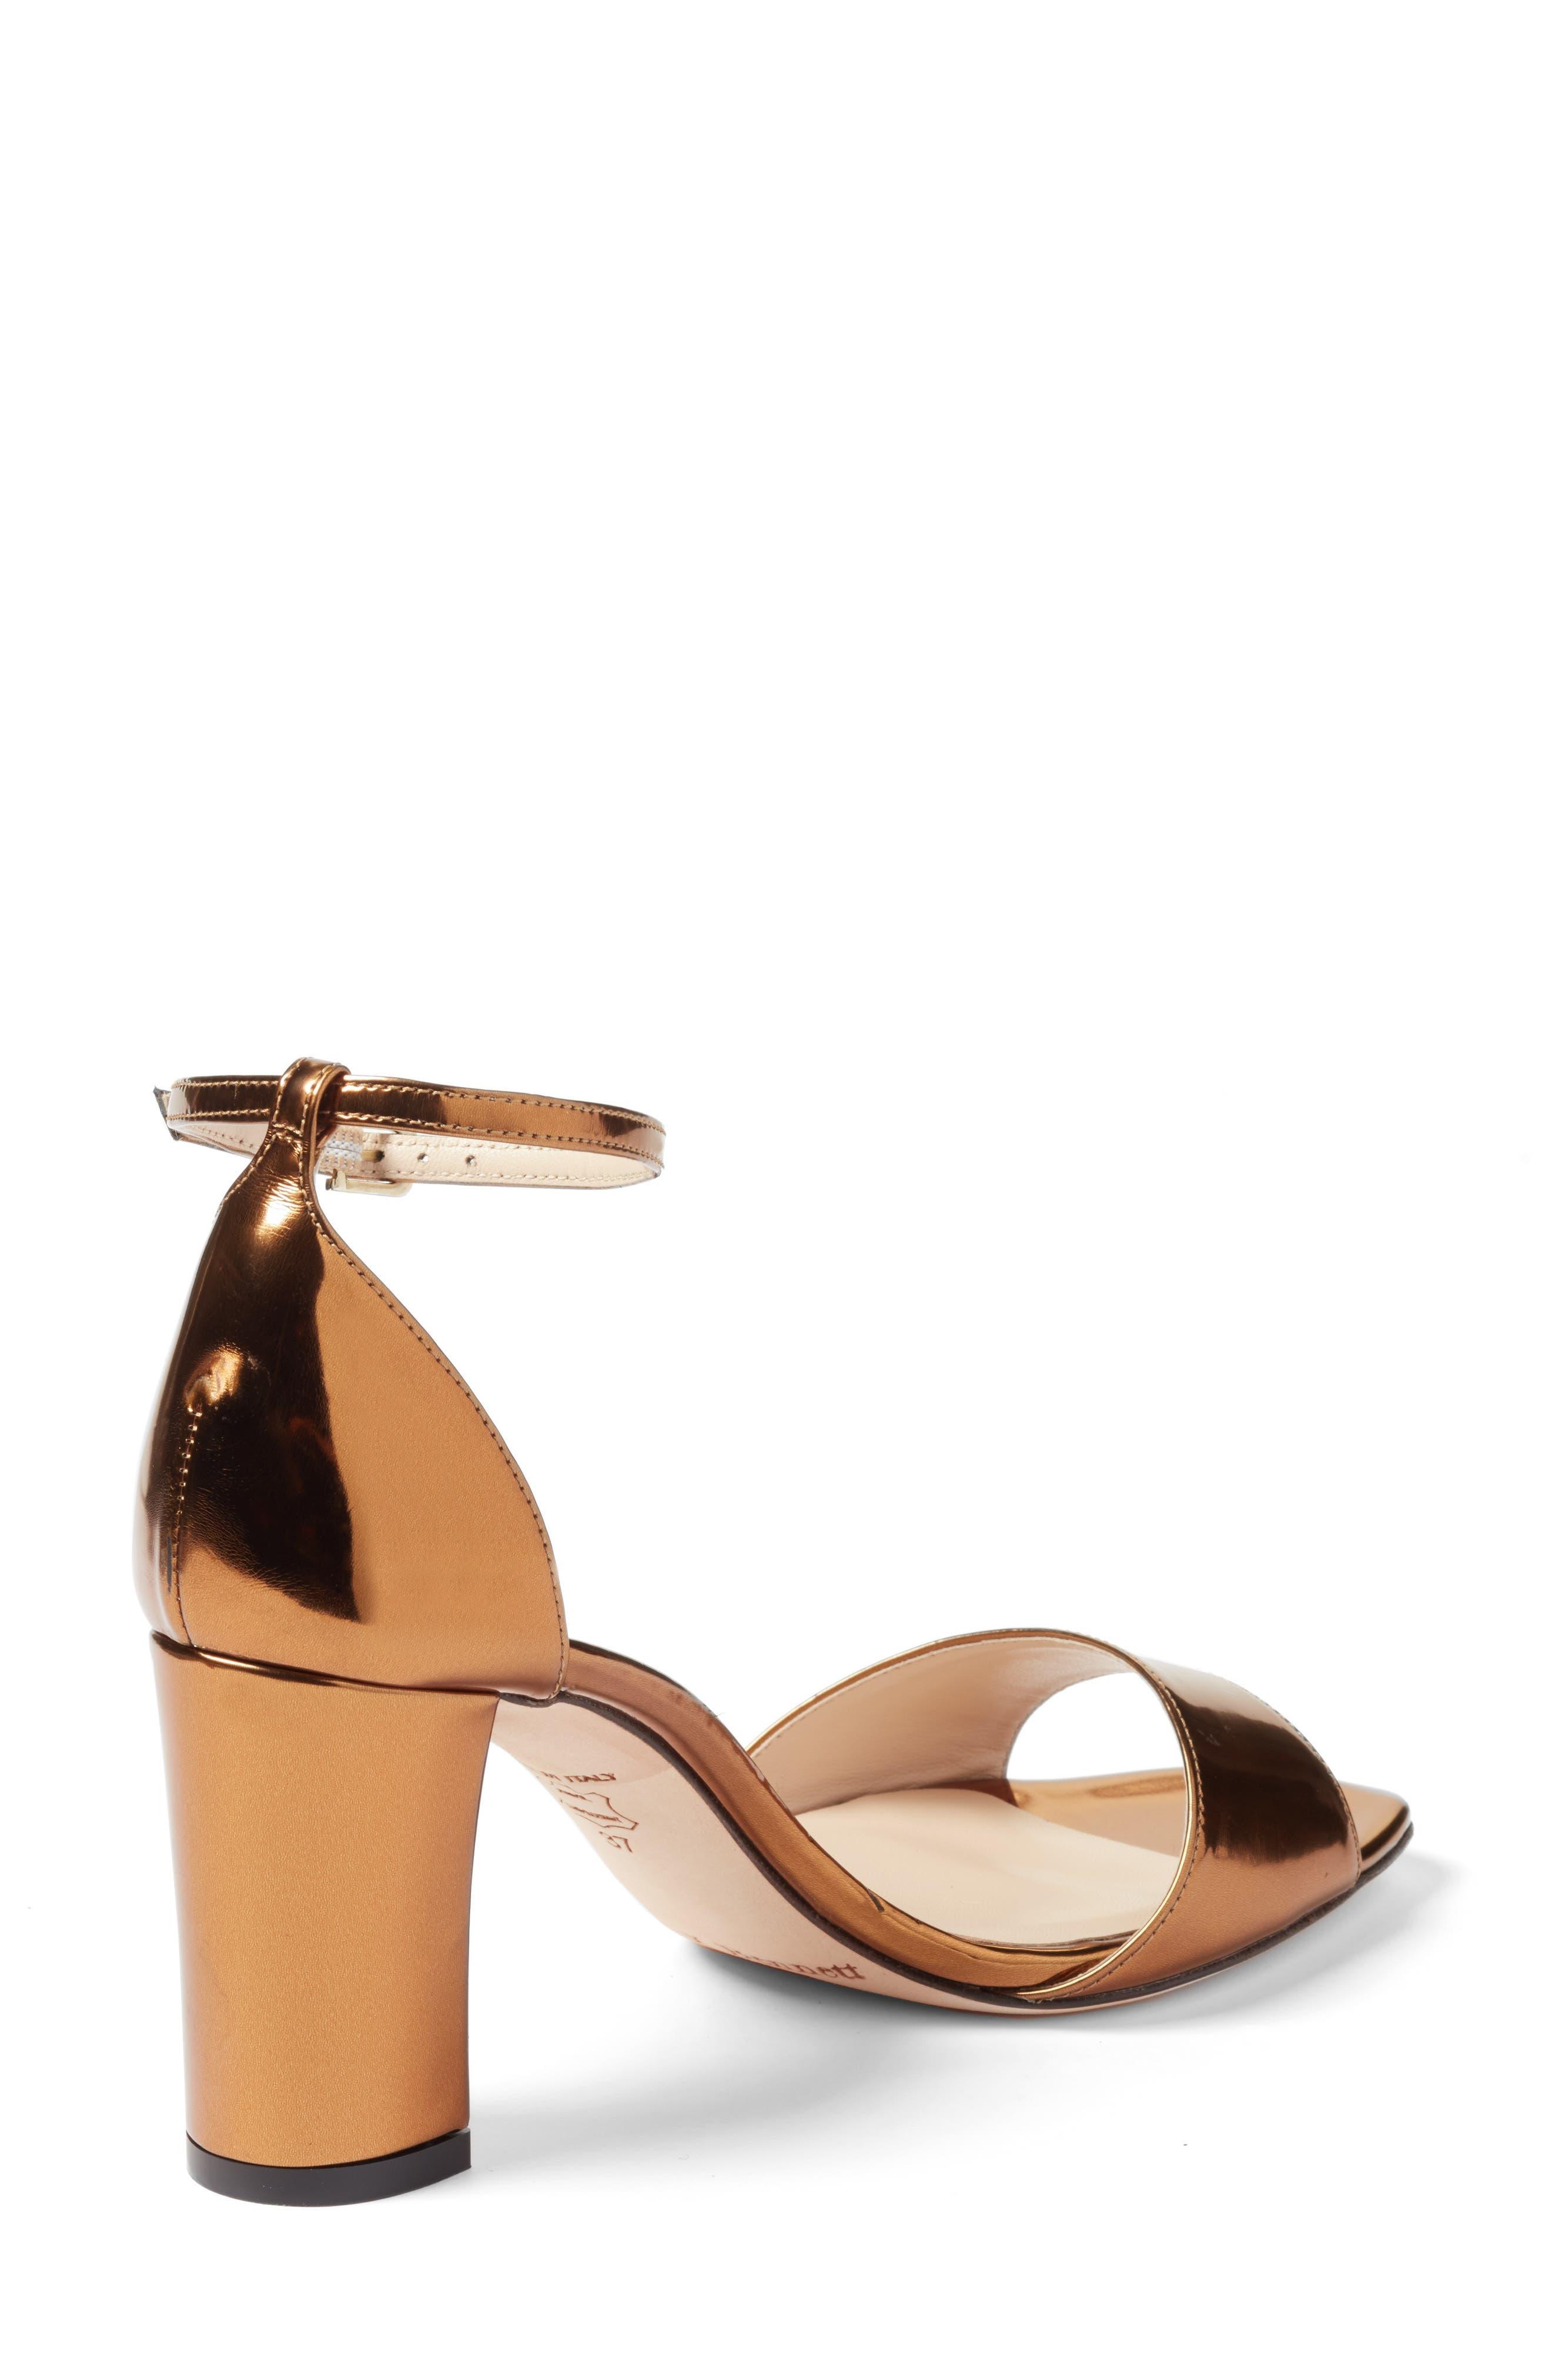 'Helena' Ankle Strap Block Heel Sandal,                             Alternate thumbnail 2, color,                             710